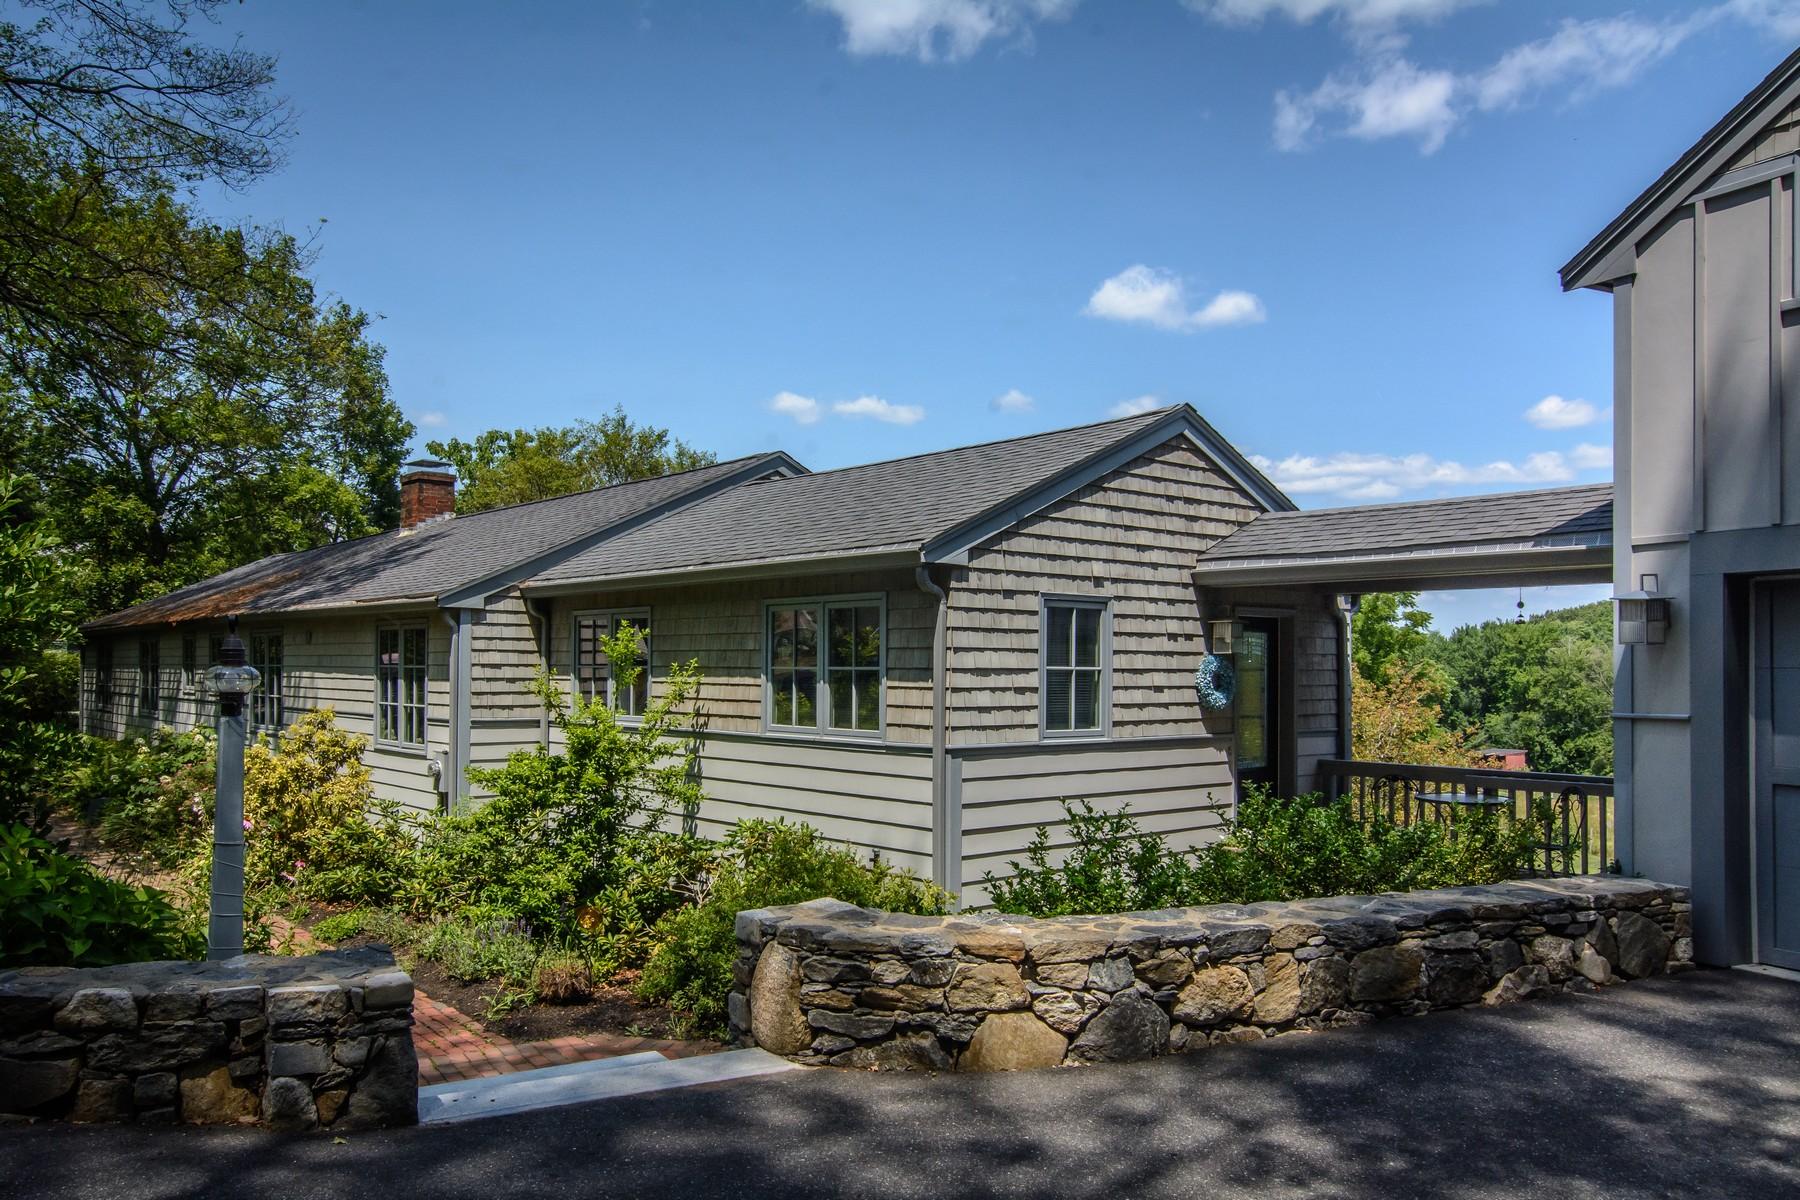 Vivienda unifamiliar por un Venta en Architect-designed Contemporary Farmhouse Ranch 26 Chestnut Street Westborough, Massachusetts, 01581 Estados Unidos